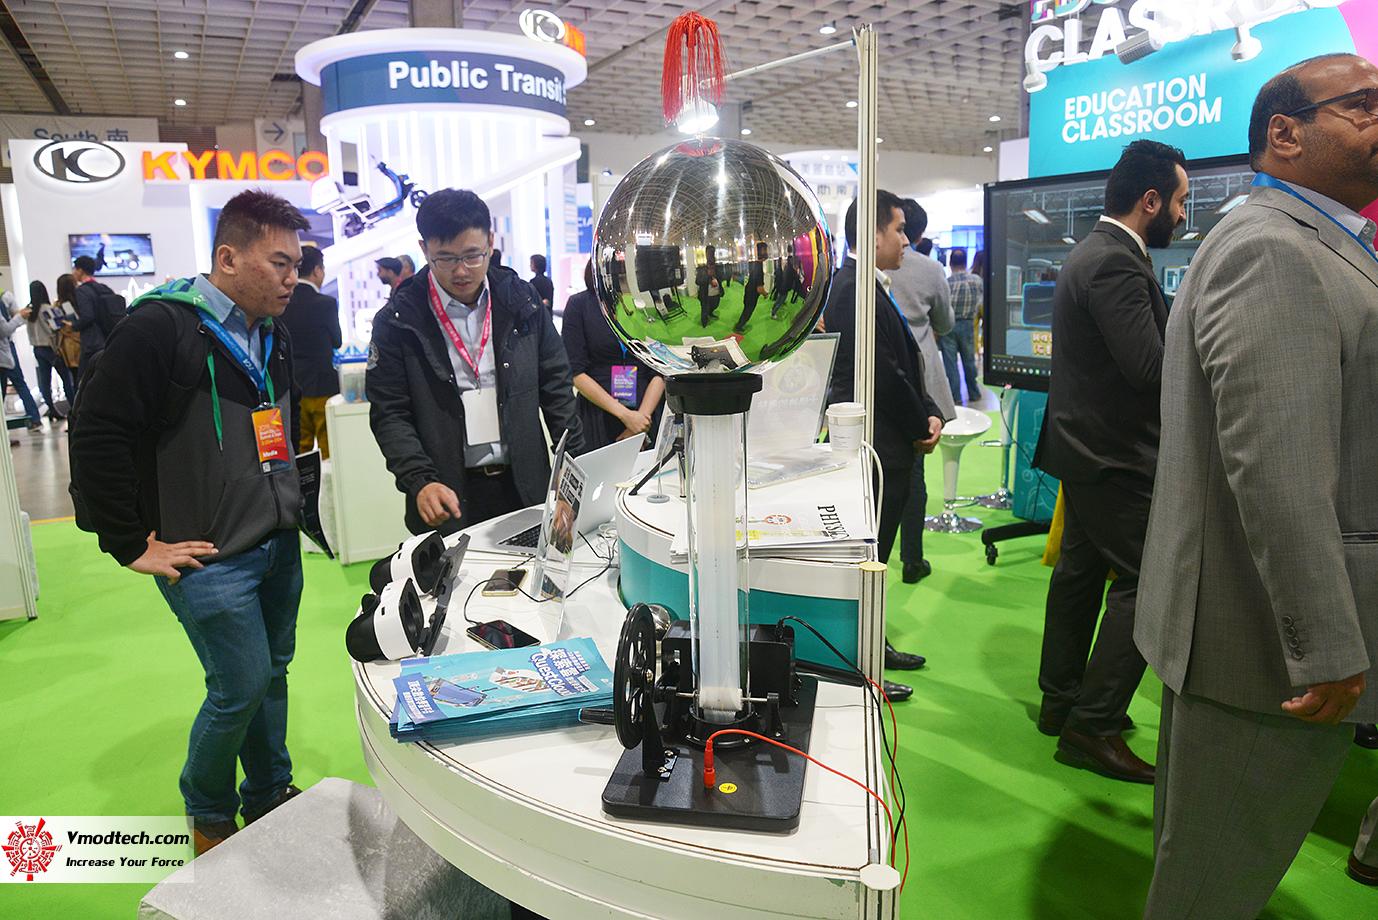 dsc 8529 เยี่ยมชมบูธ Smart Education ระบบการศึกษาอัจฉริยะในงาน 2019 SMART CITY SUMMIT & EXPO ณ กรุงไทเป ประเทศไต้หวัน